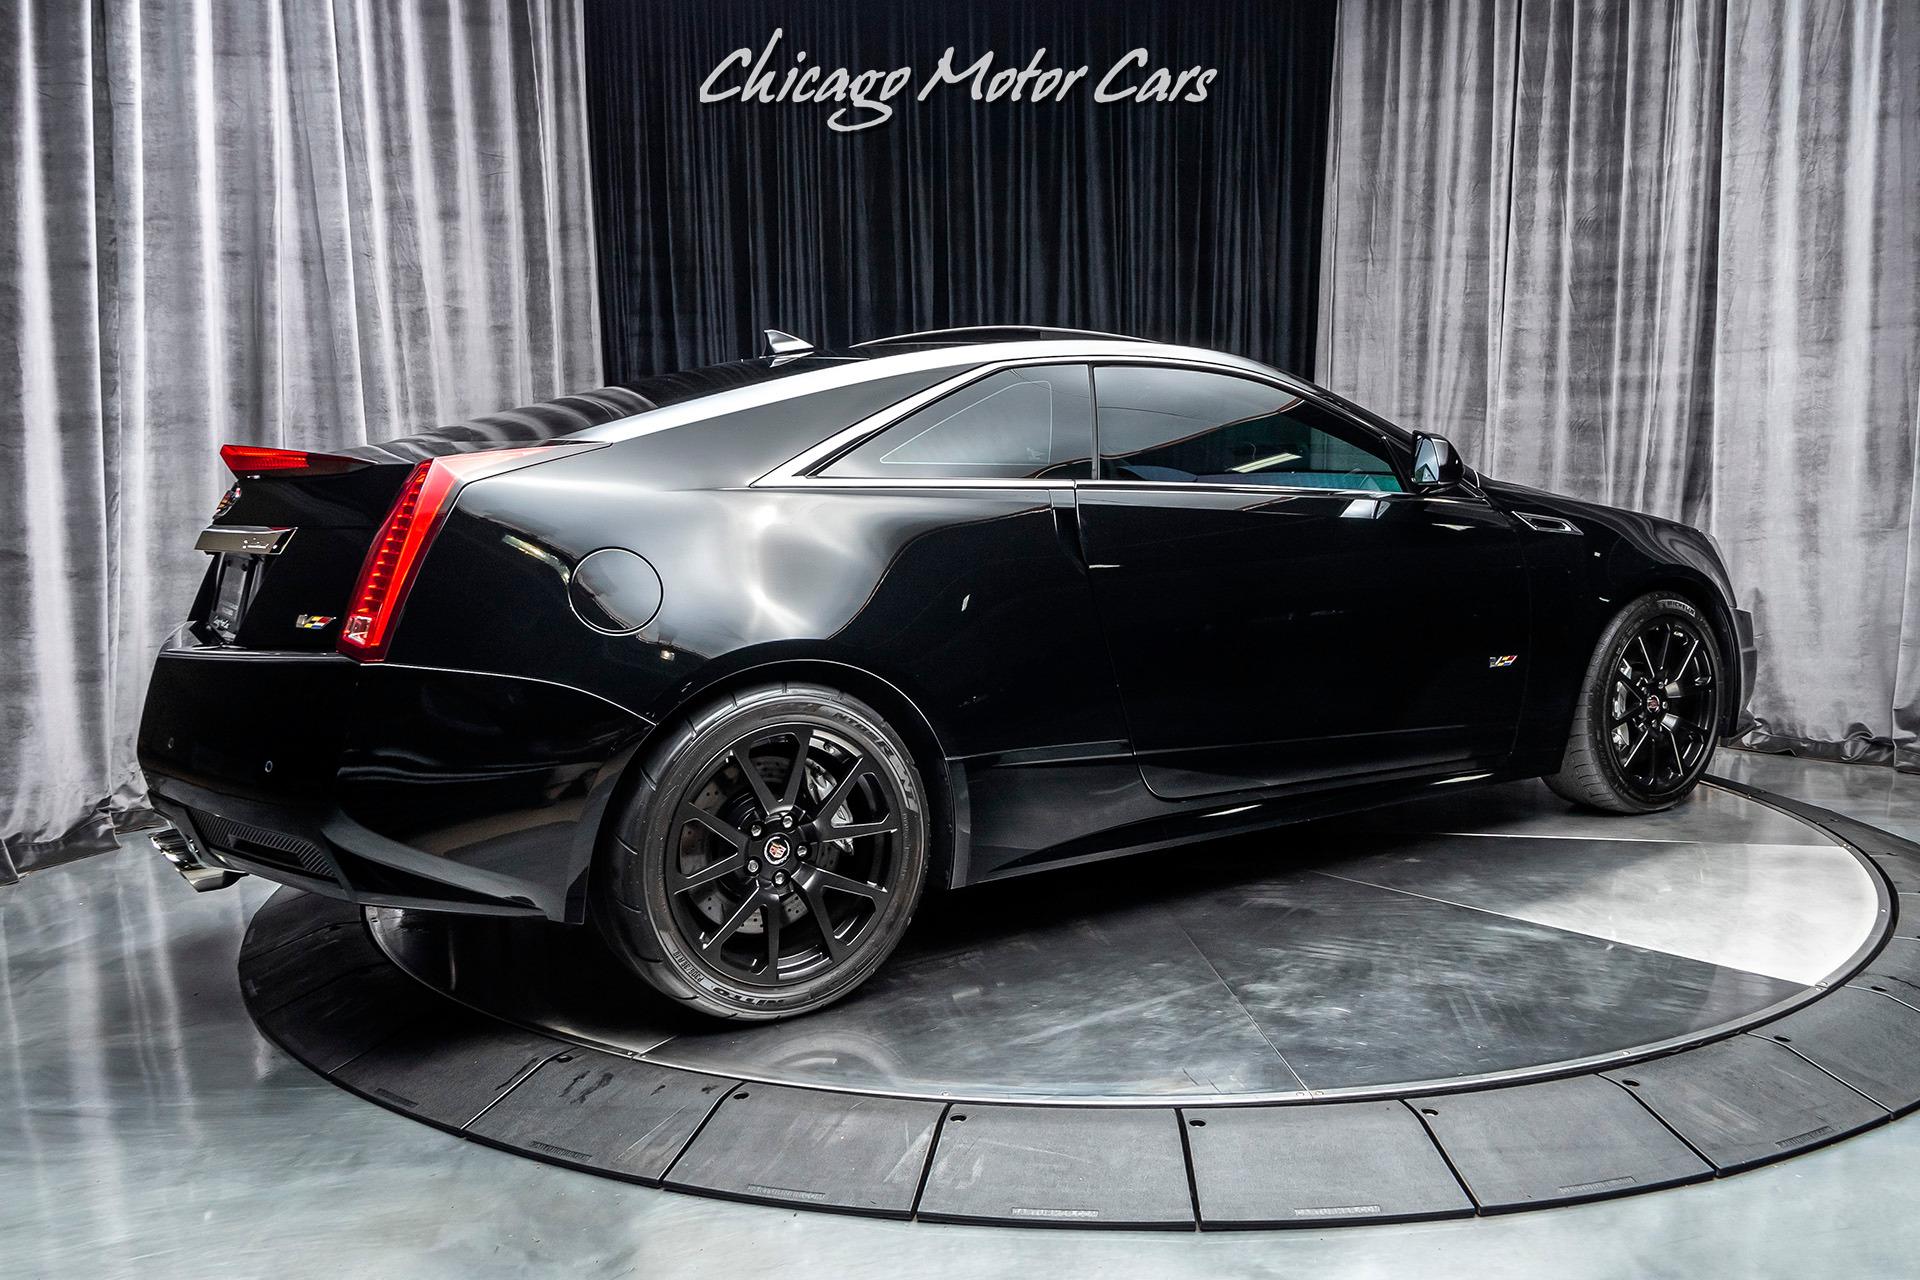 Used-2012-Cadillac-CTS-V-Coupe-800WHP-6-SPEED-MANUAL-RECARO-SEATS